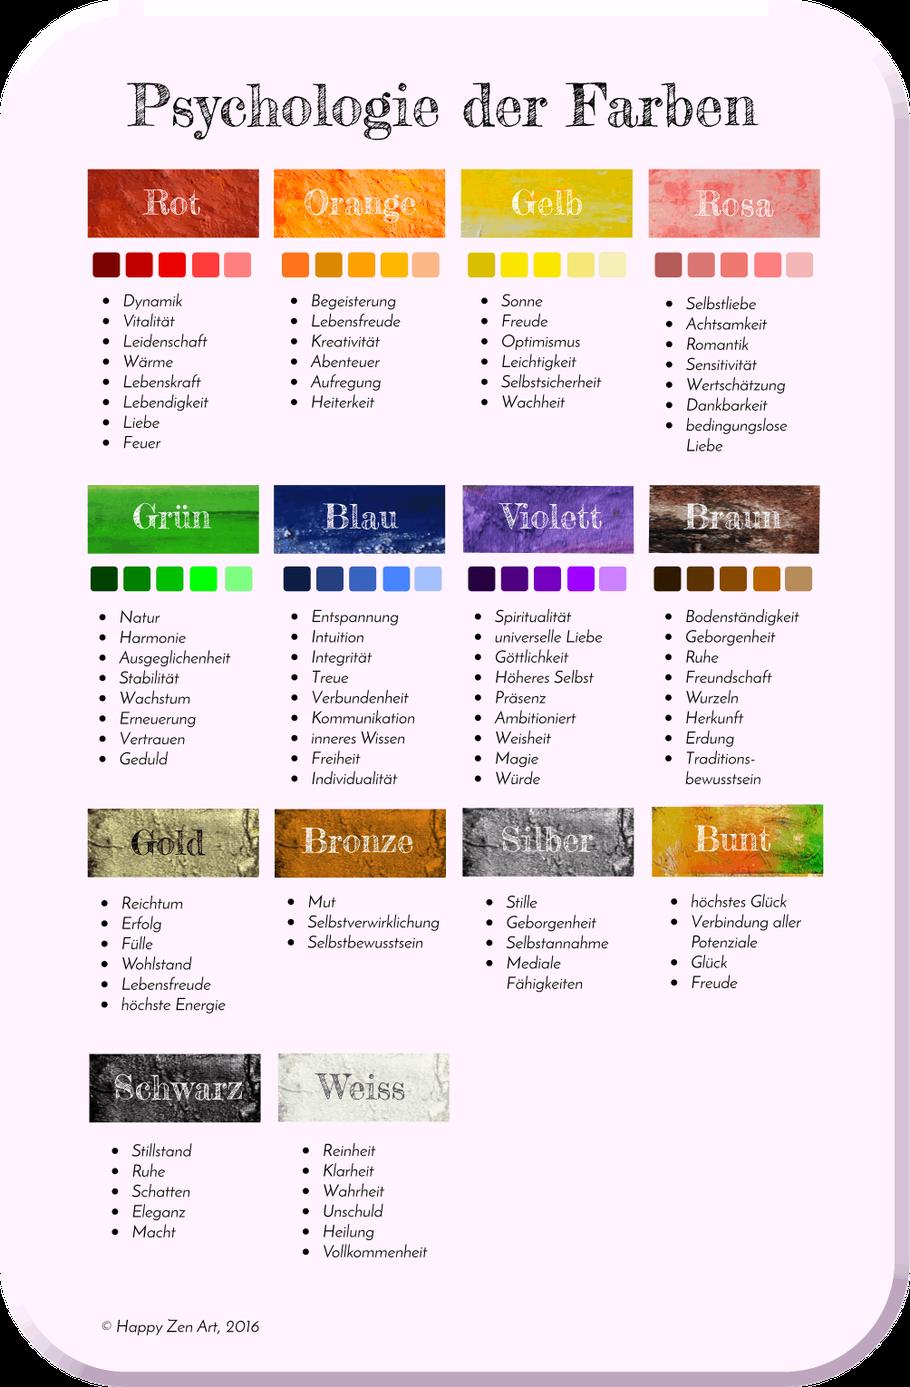 psychologie der farben happy zen art farbpsychologie farbwirkung farbtabelle training. Black Bedroom Furniture Sets. Home Design Ideas